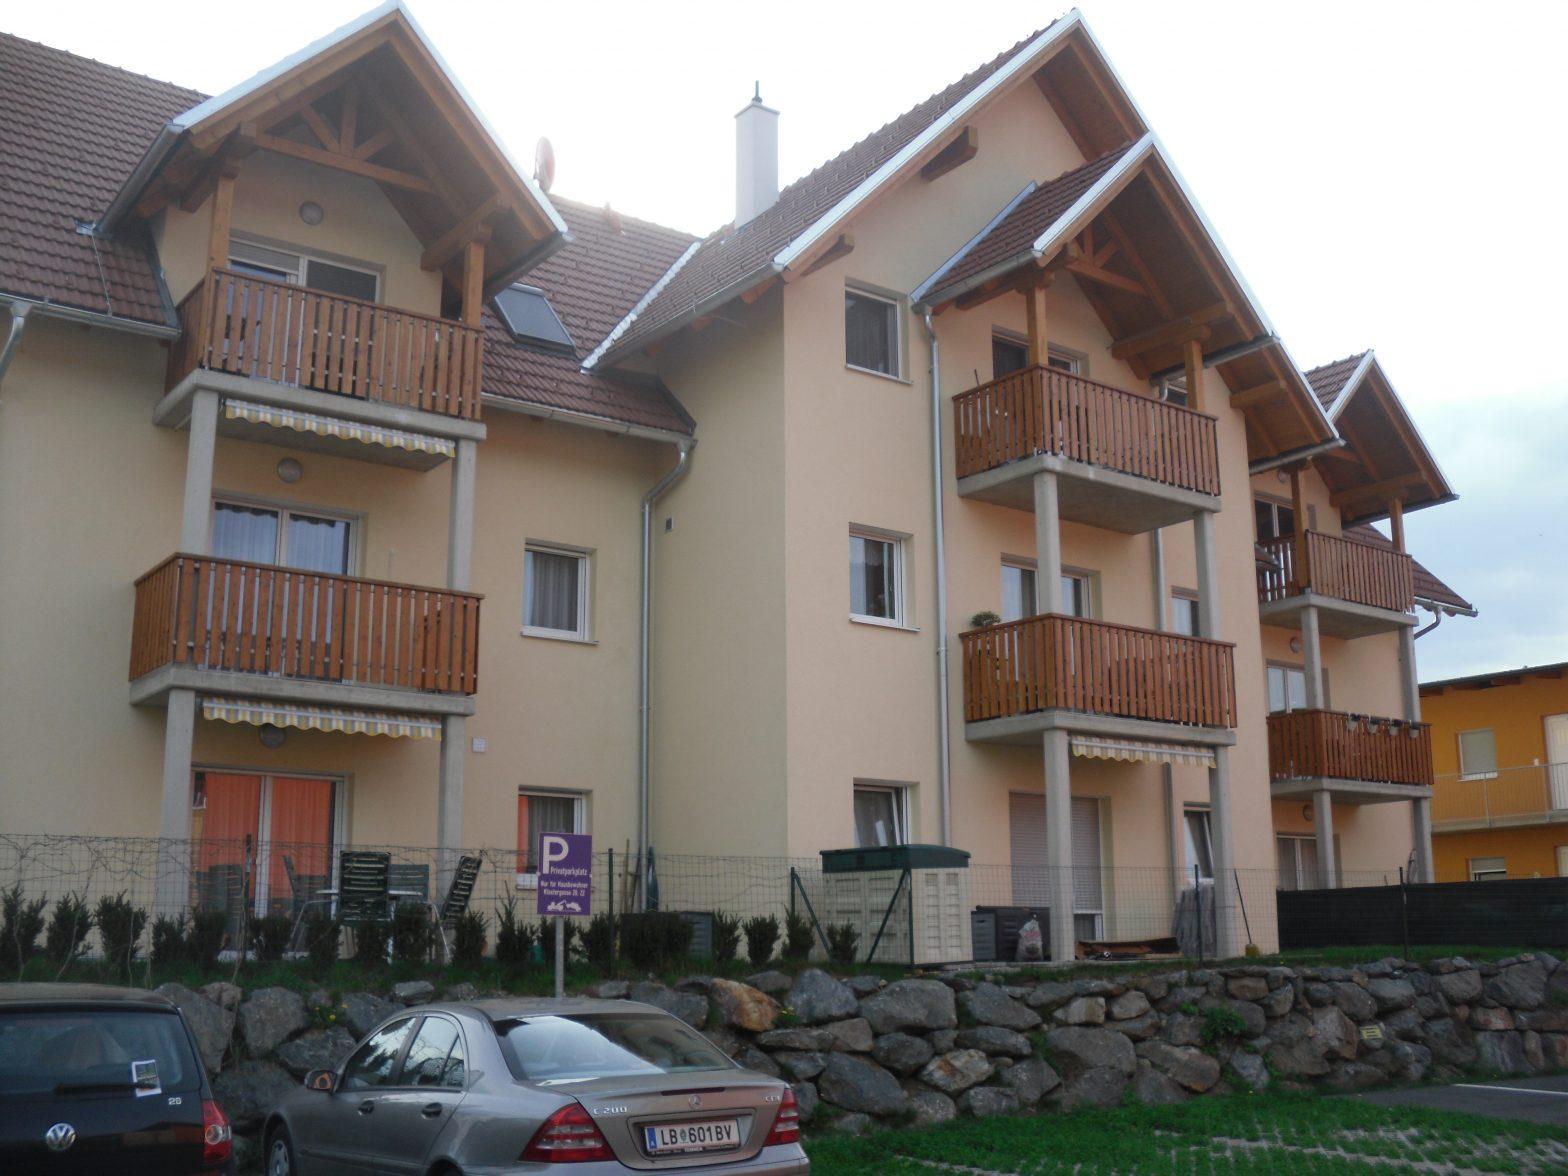 Holler Wohnbau Martinsgasse